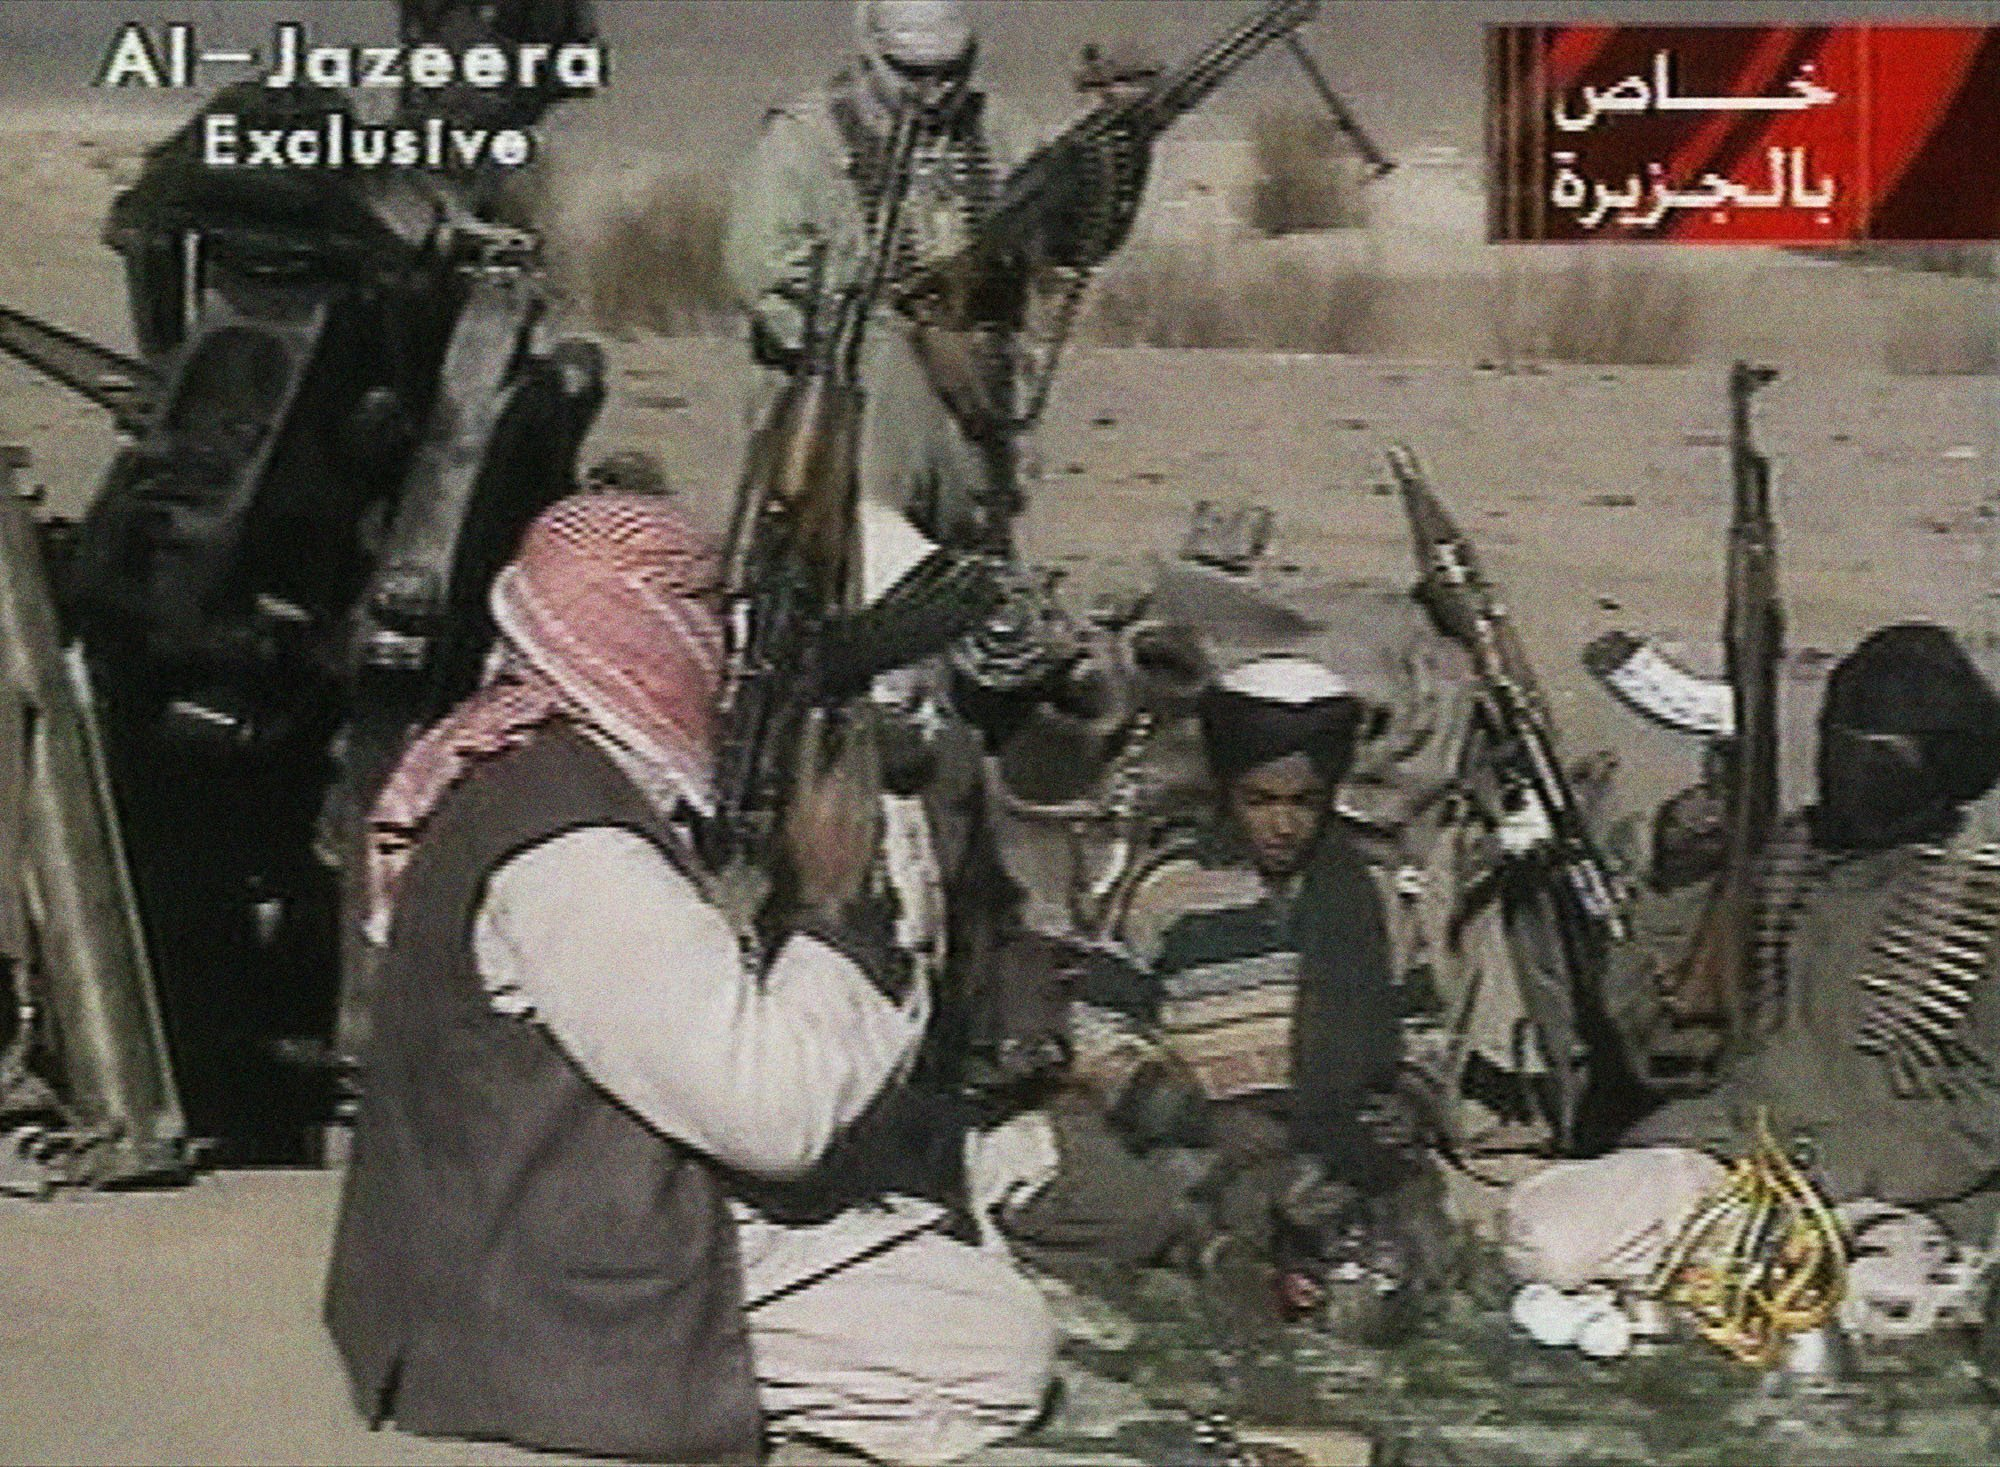 Born into al-Qaida: Hamza bin Laden's rise to prominence